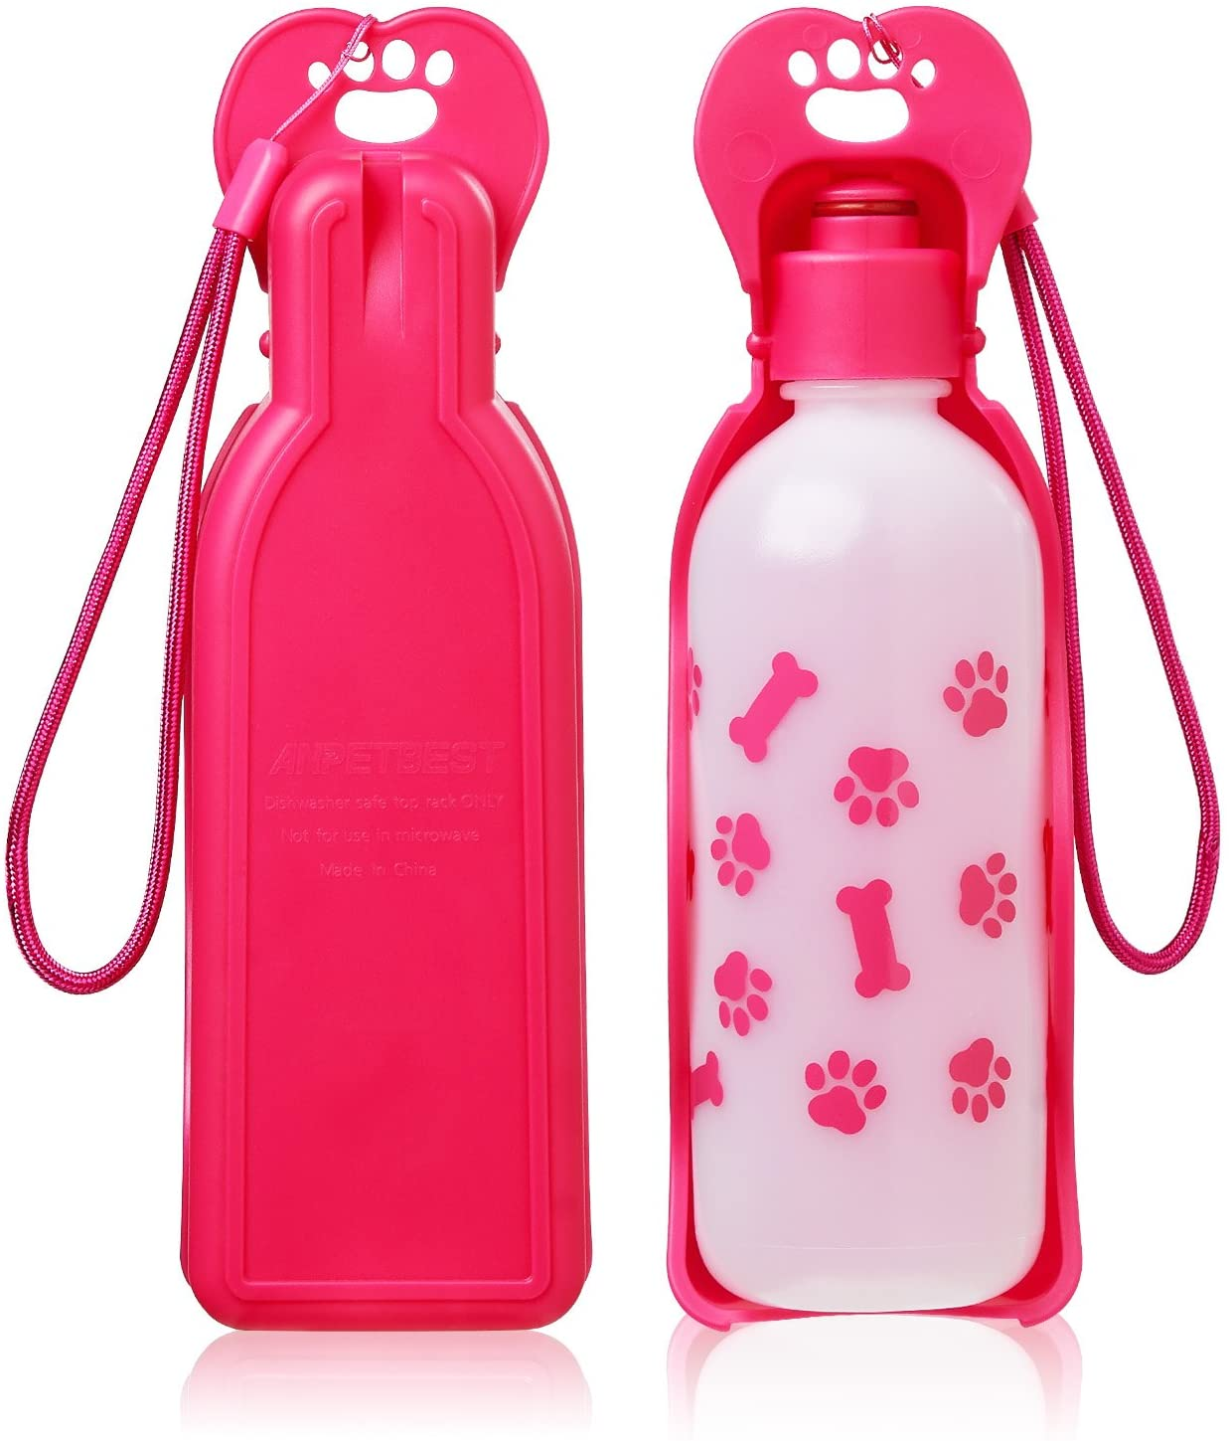 ANPETBEST Dog Water Bottle 325ML/11oz 650ML/22oz Portable Dispenser Travel Water Bottle Bowl for Dog Cat Small Animals (325ml/11oz, Pink)